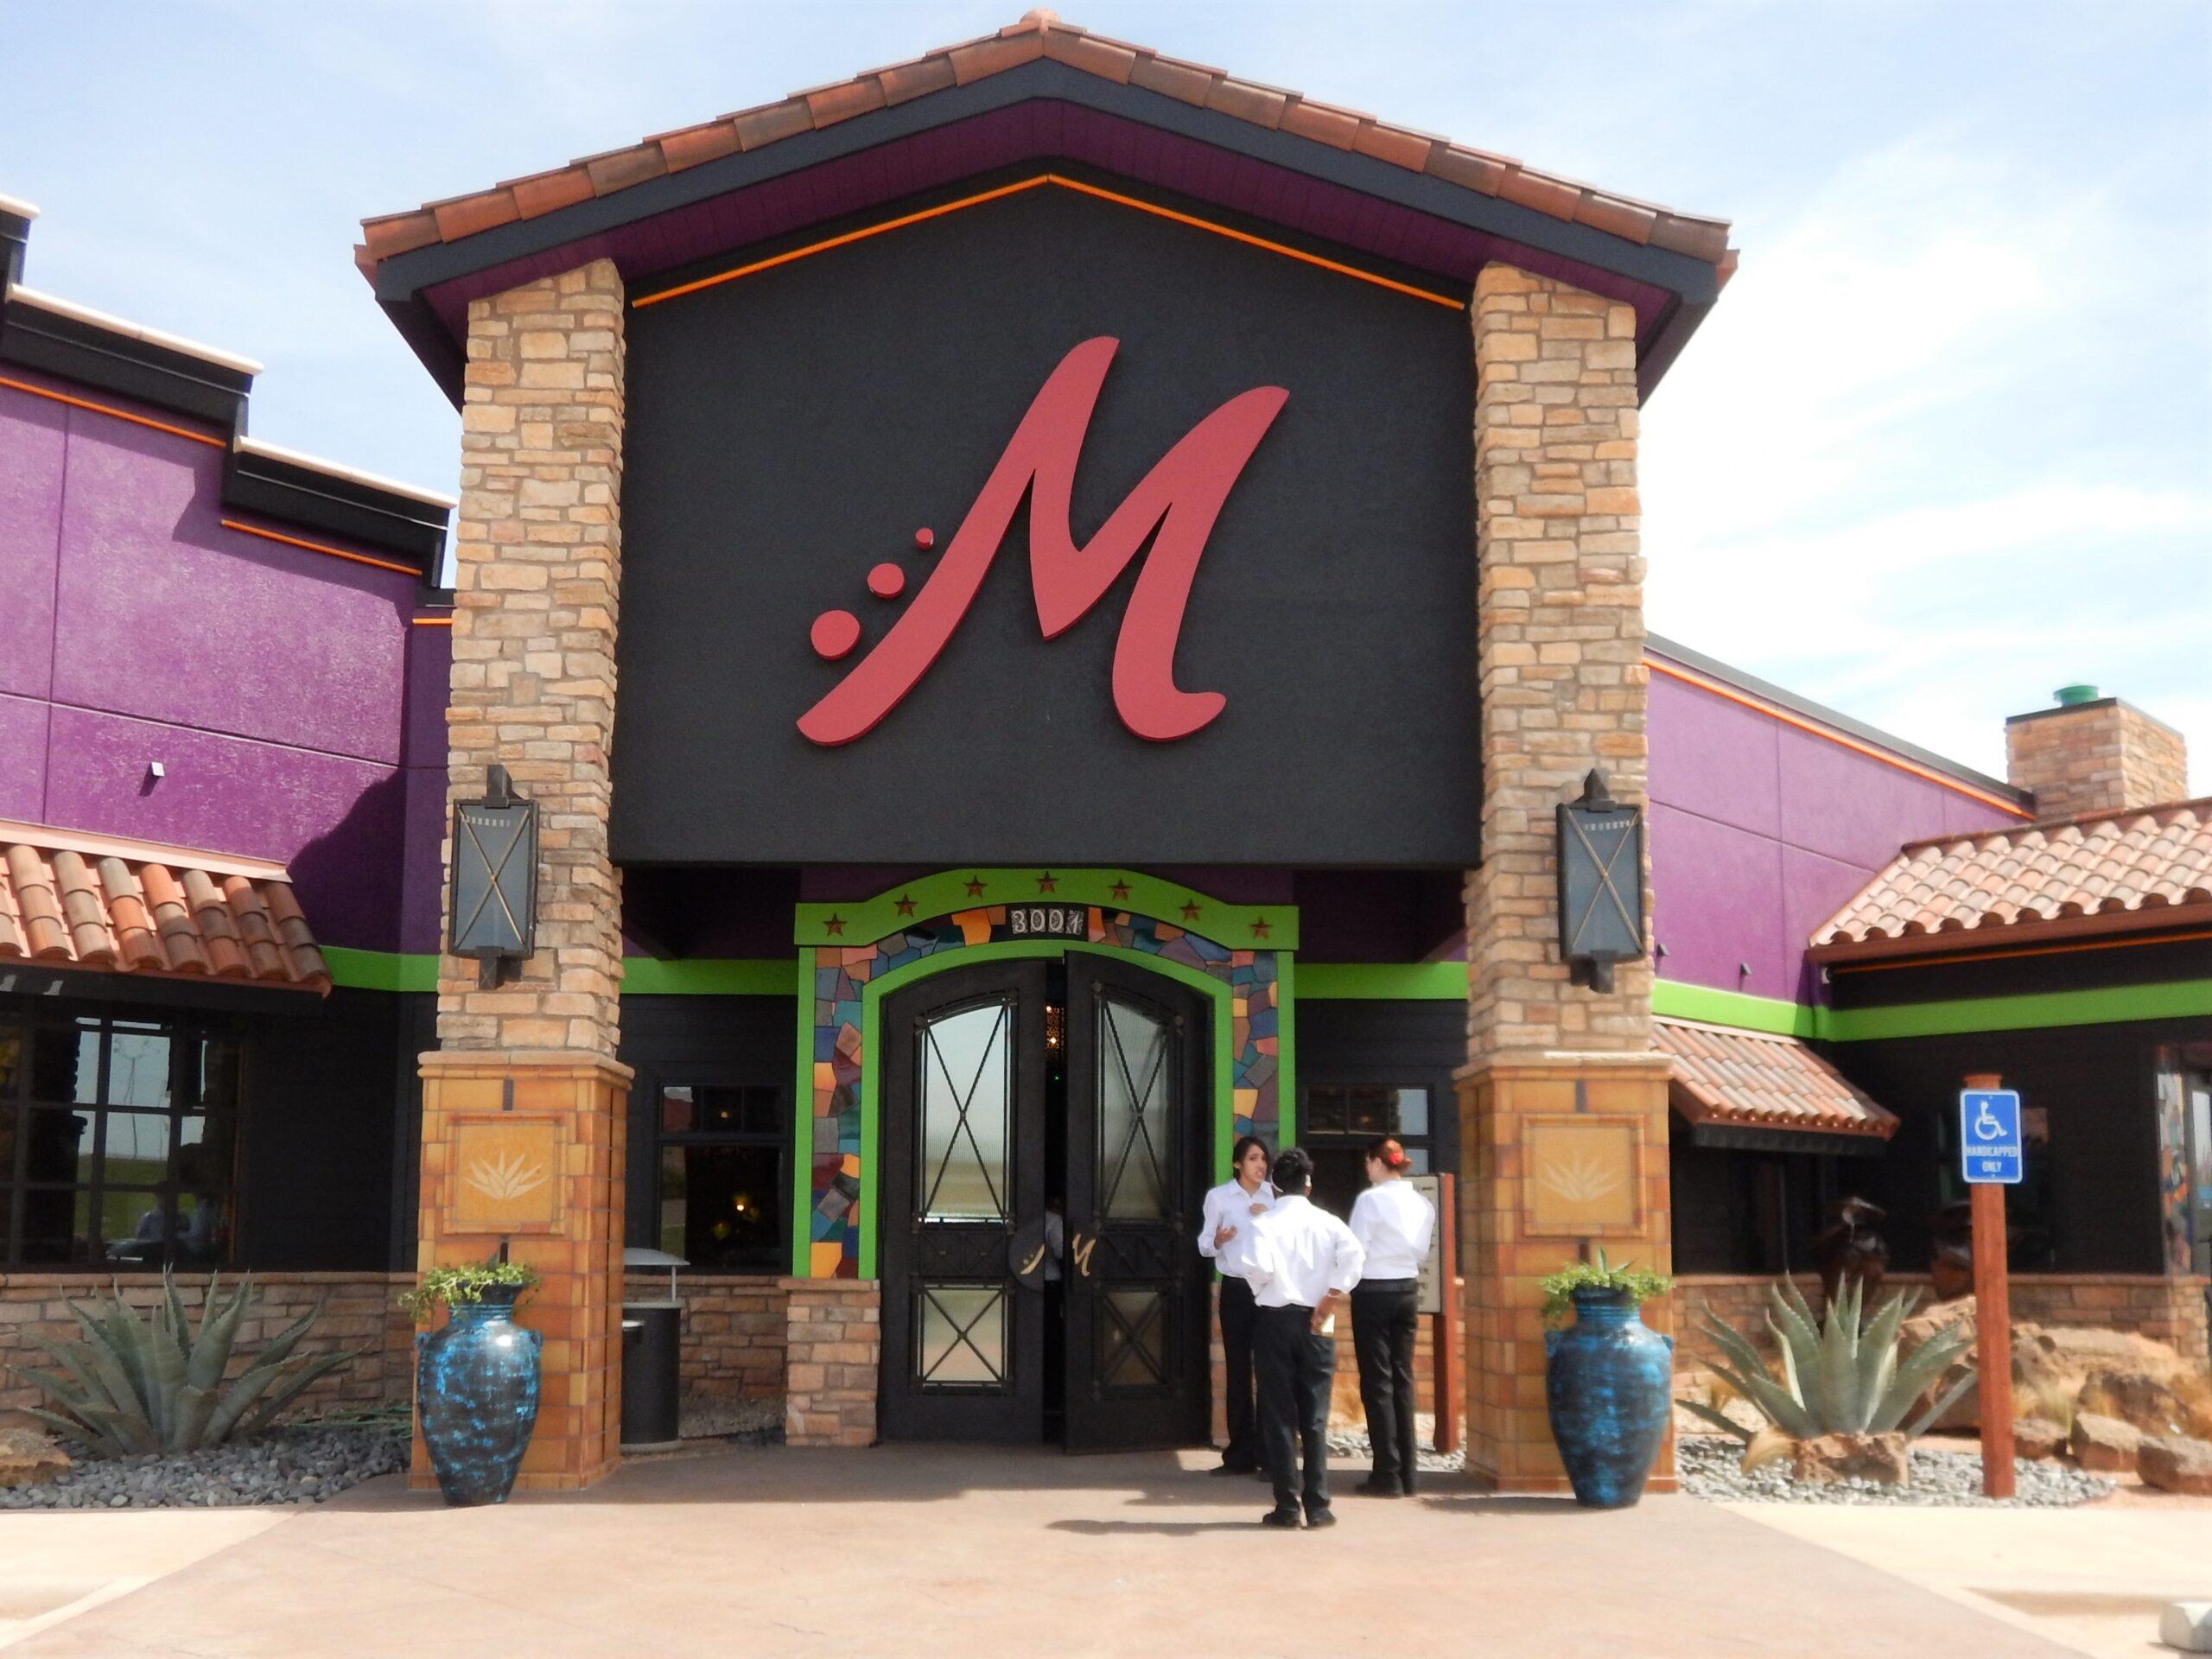 Miguel's-Restaurant-Midland-TX-Steel-commercial-Main-Door-Entry-windows-railings-lighting-Avanti-OLS-MOD-B003 (14)